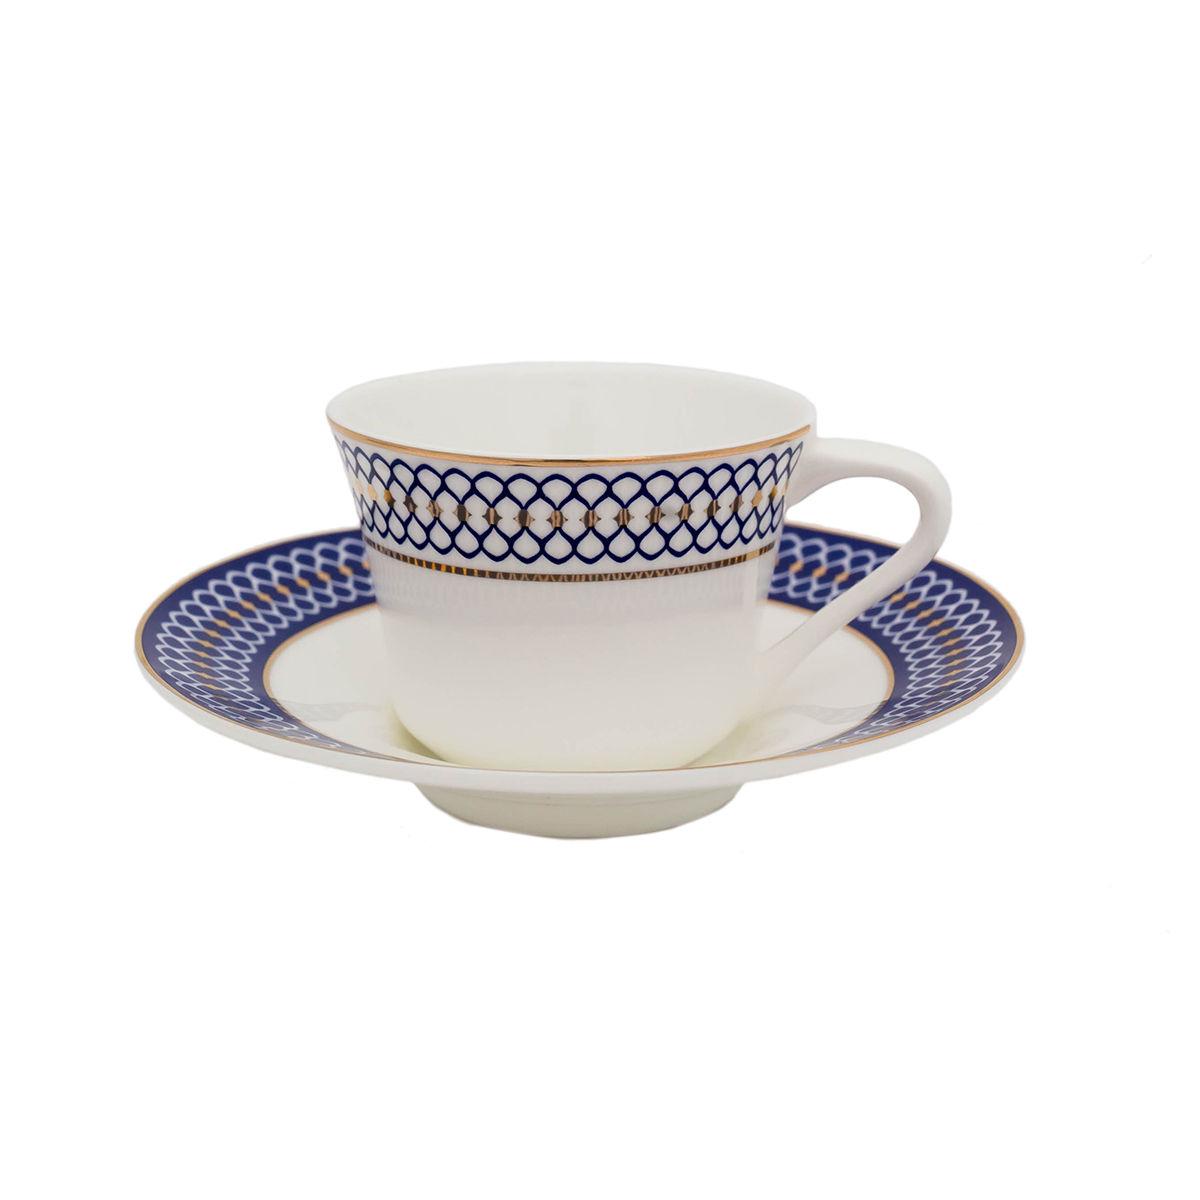 CALLIOPE Serviciu ceai portelan 6 persoane 220 ml